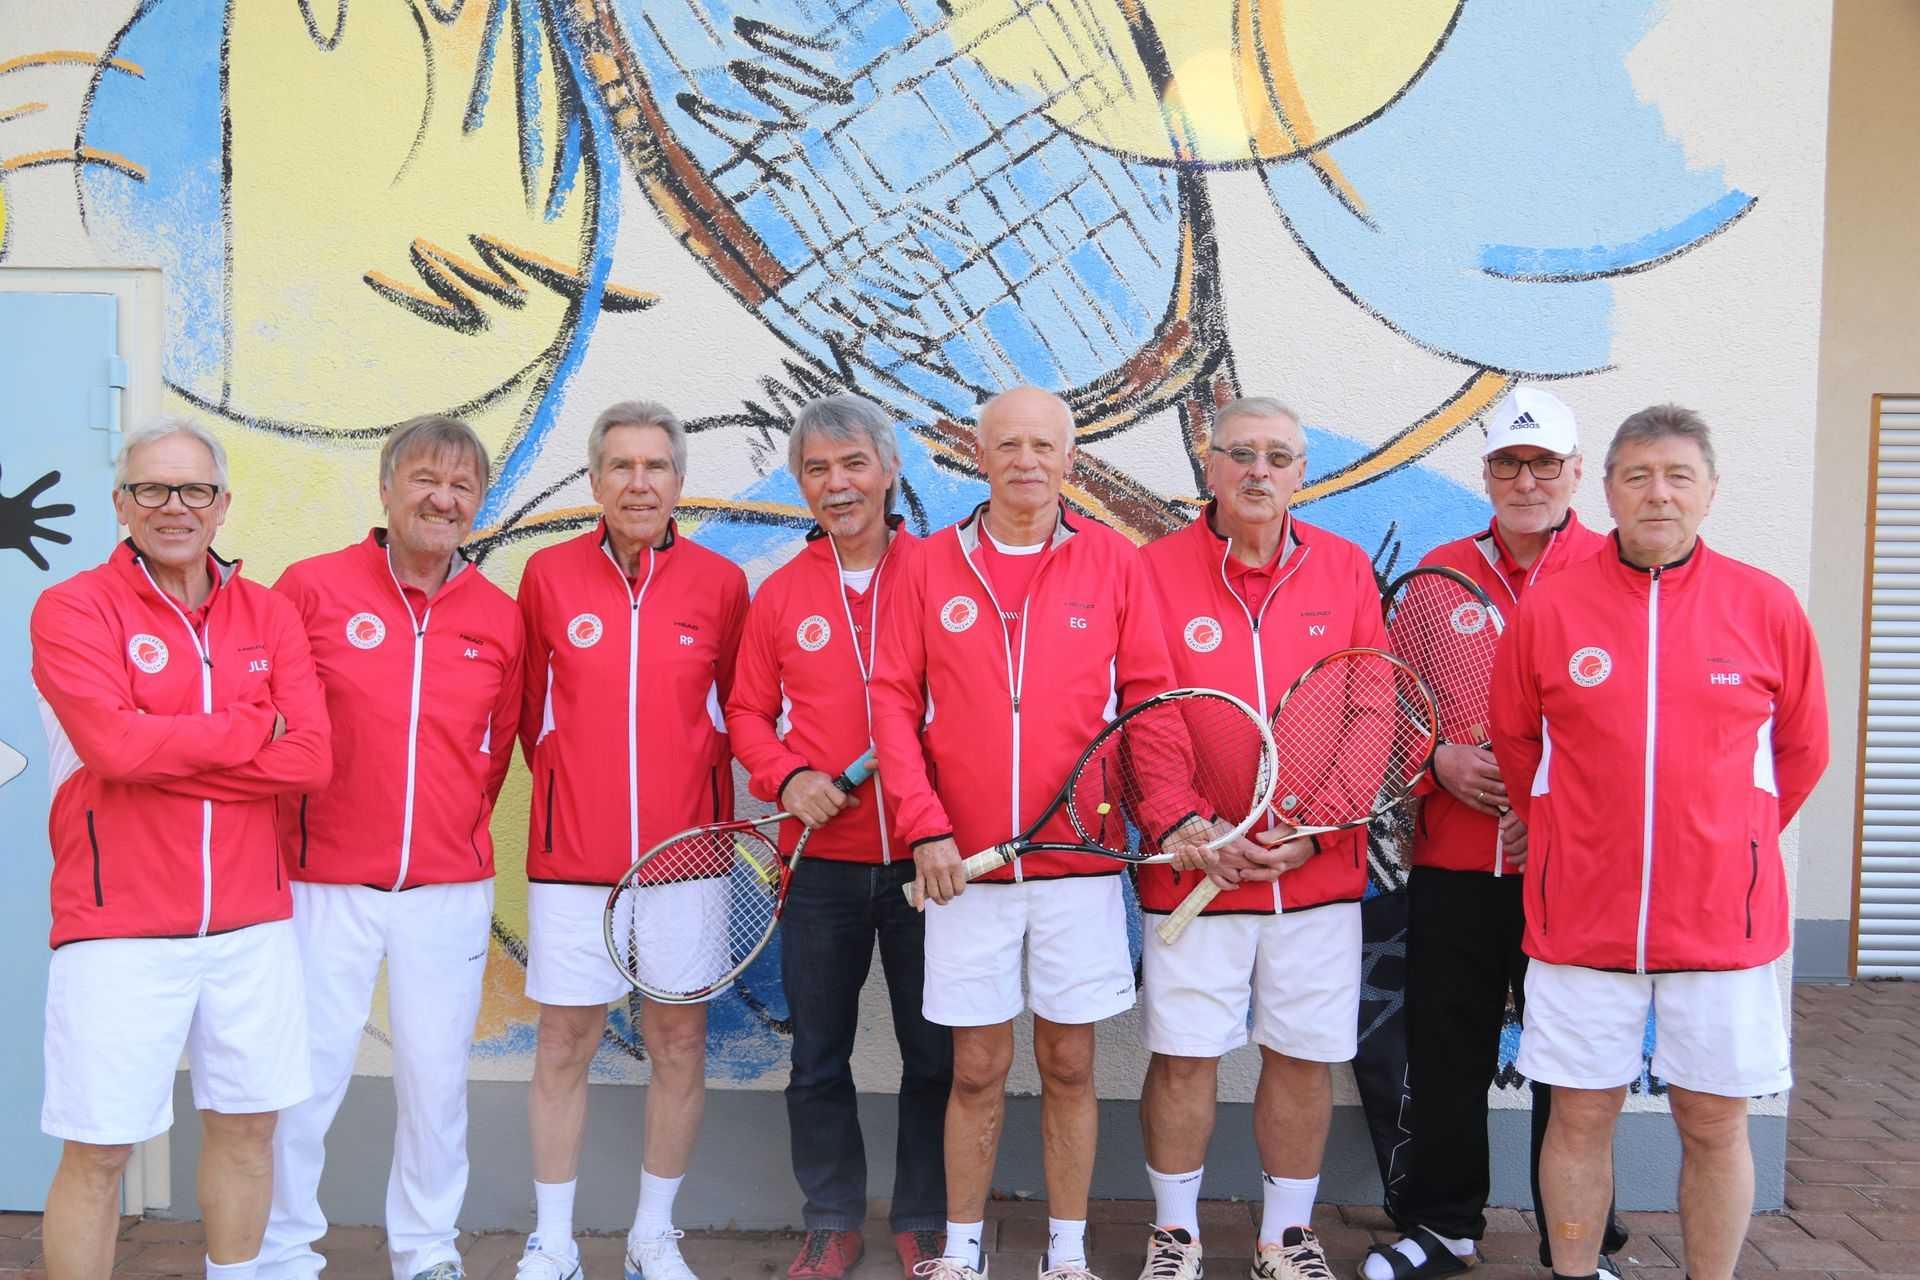 Tennisverein Kenzingen manschafte 32